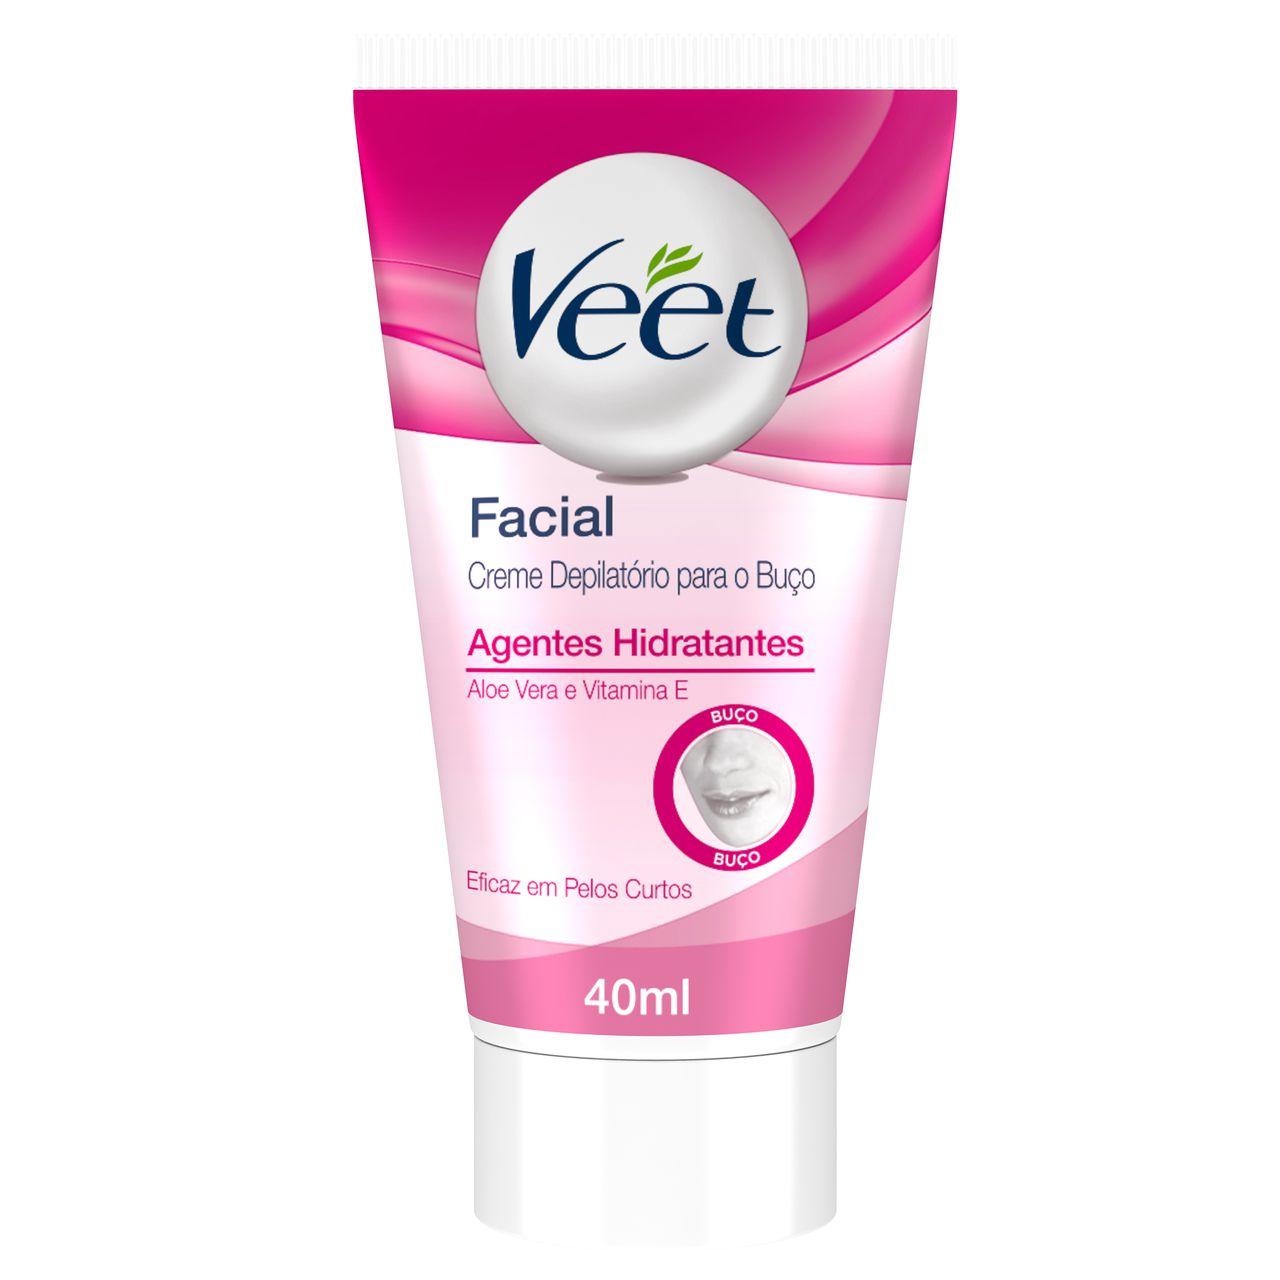 Creme Depilatório Facial Veet 40ml Aloe Vera e Vitamina E